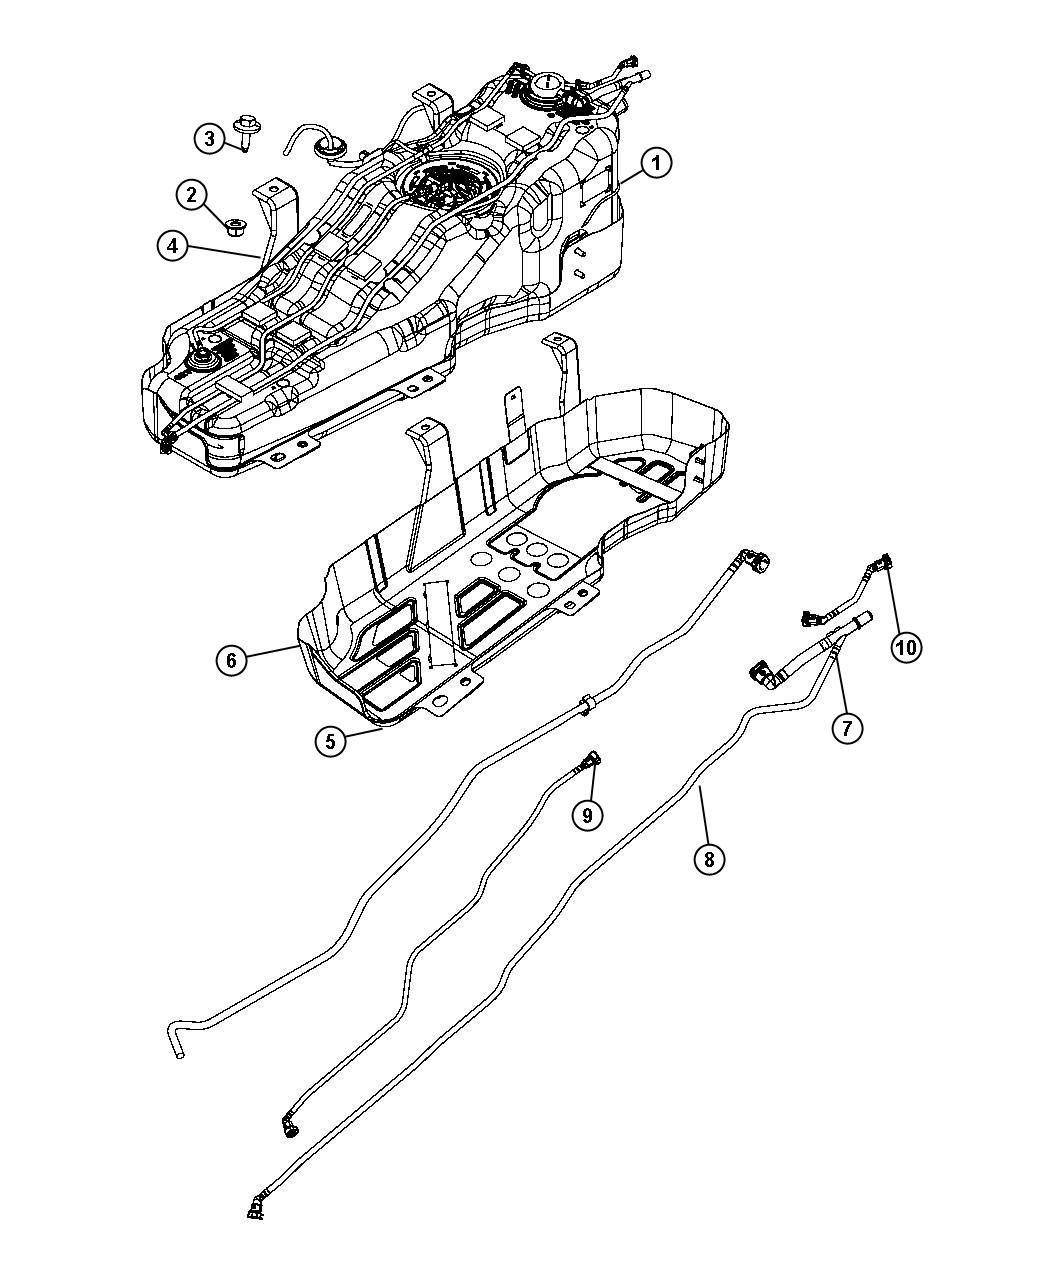 Jeep Liberty Tube Fuel Supply 18 5 Gallon Fuel Tank